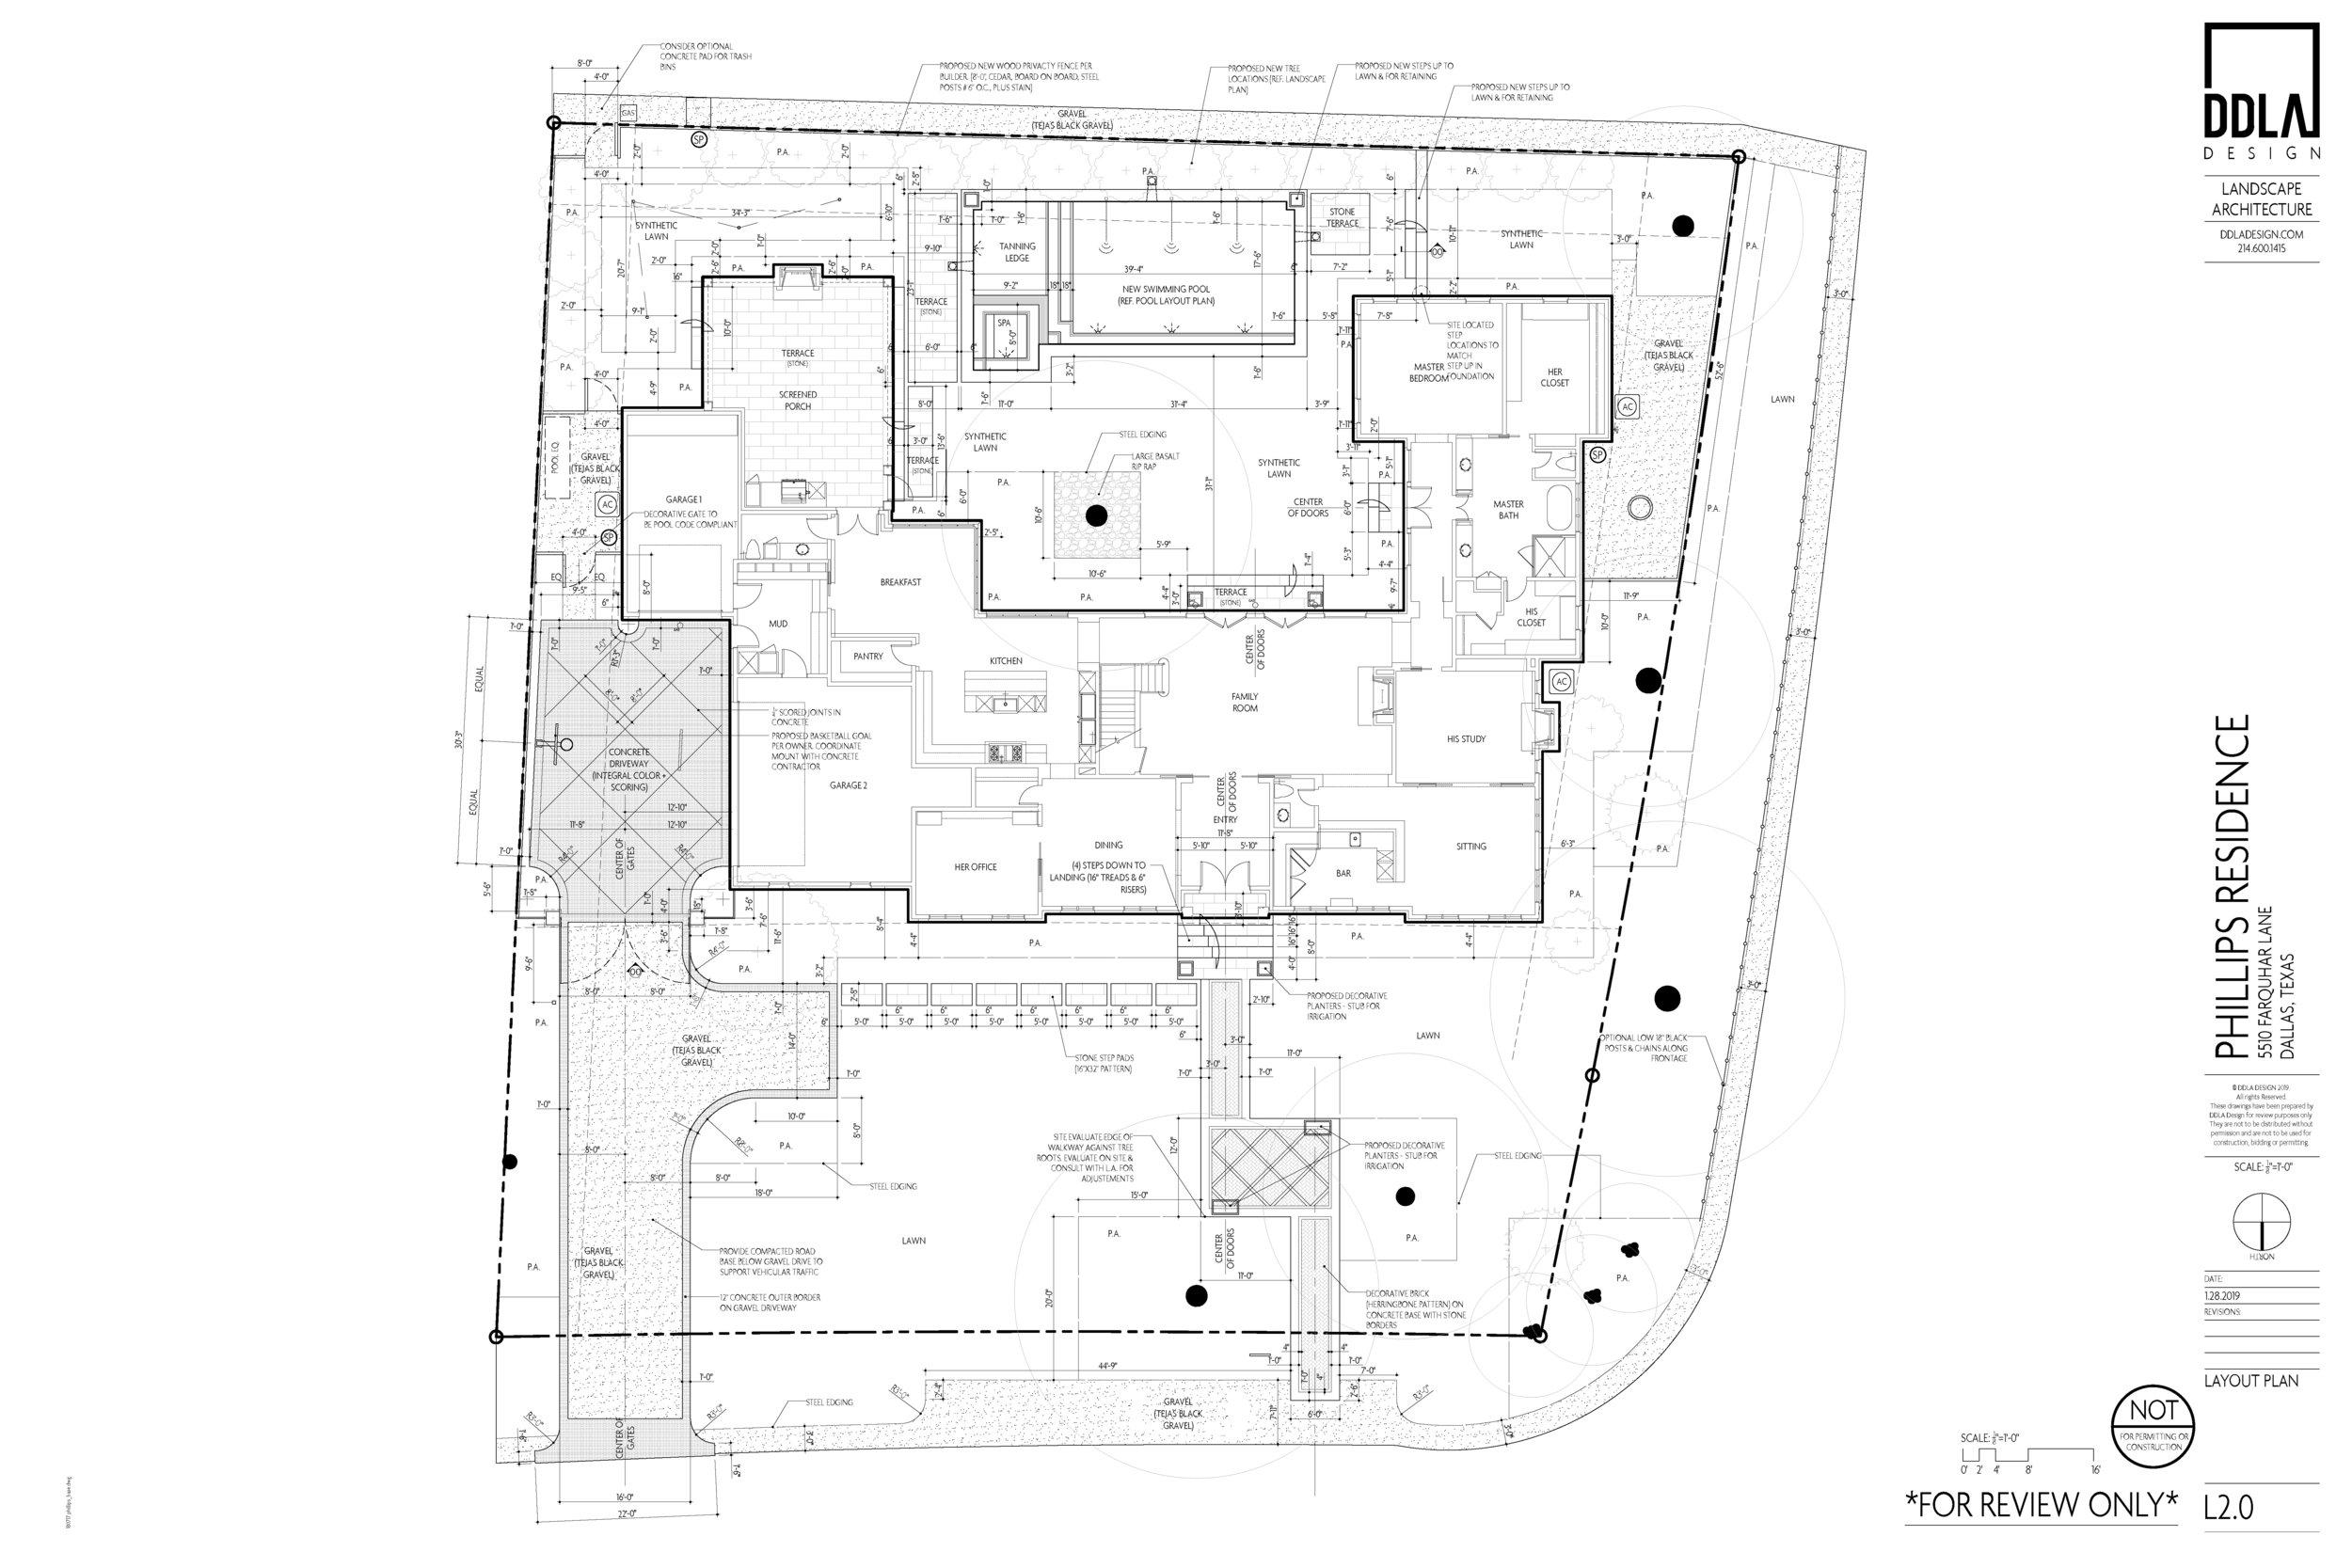 190128 phillips_L2.0 layout.jpg